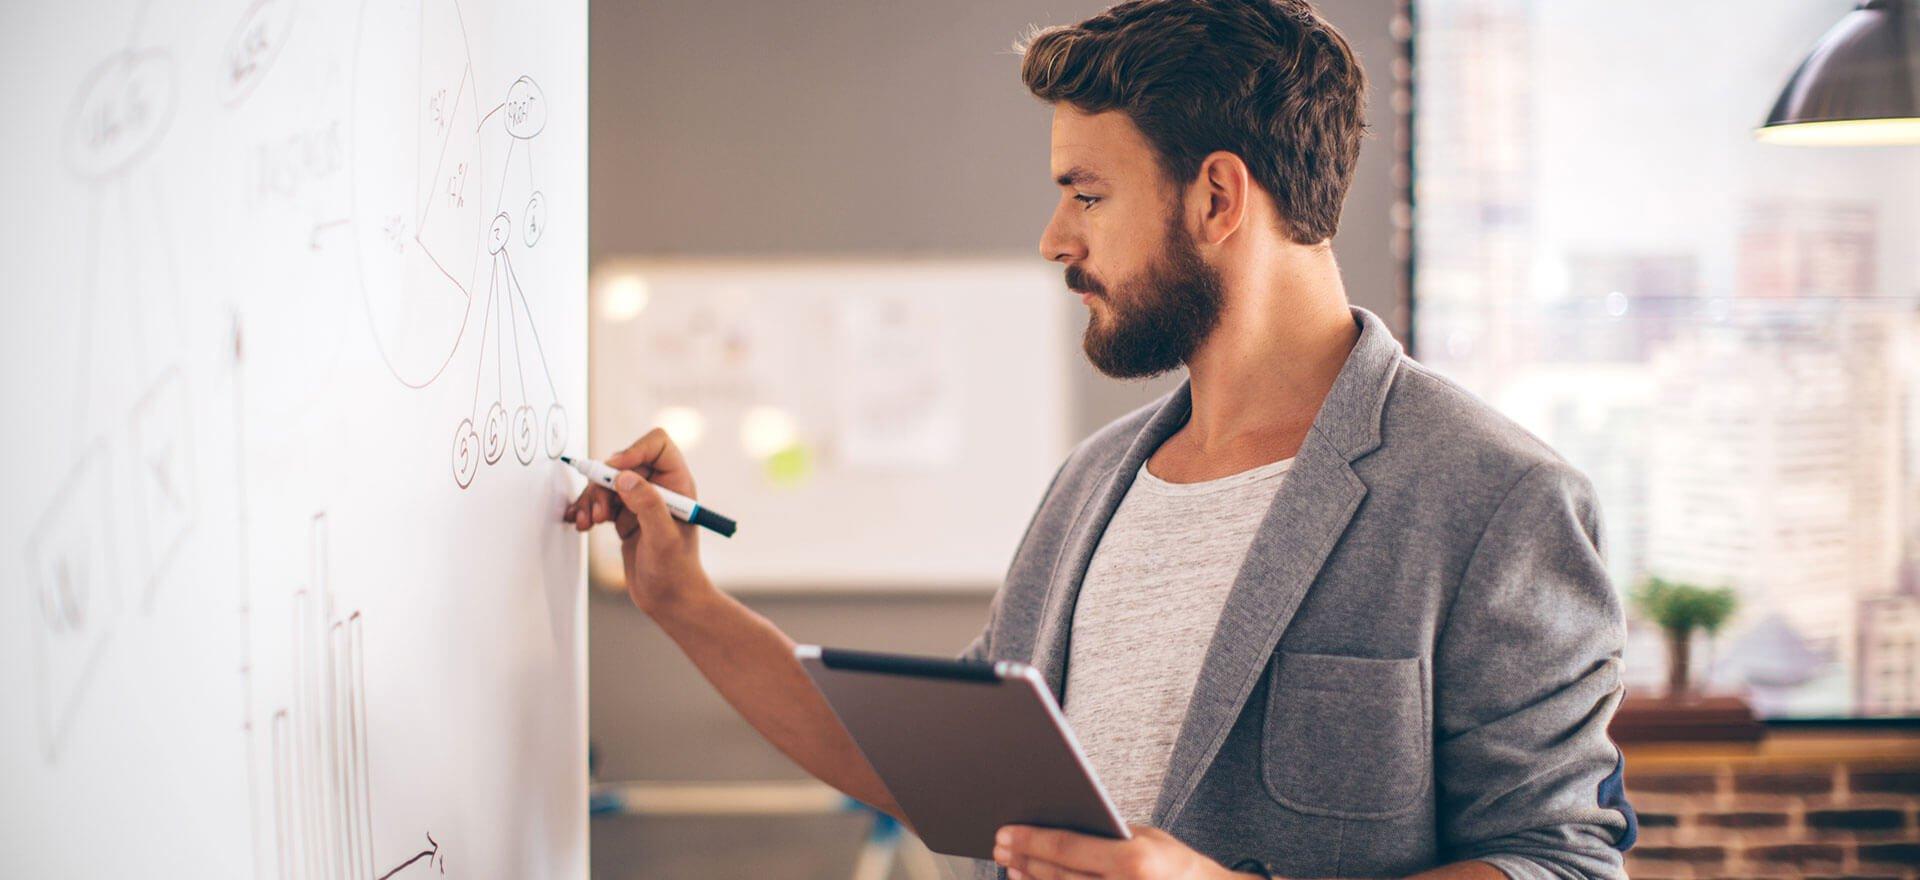 Man calculating financial ratios on whiteboard